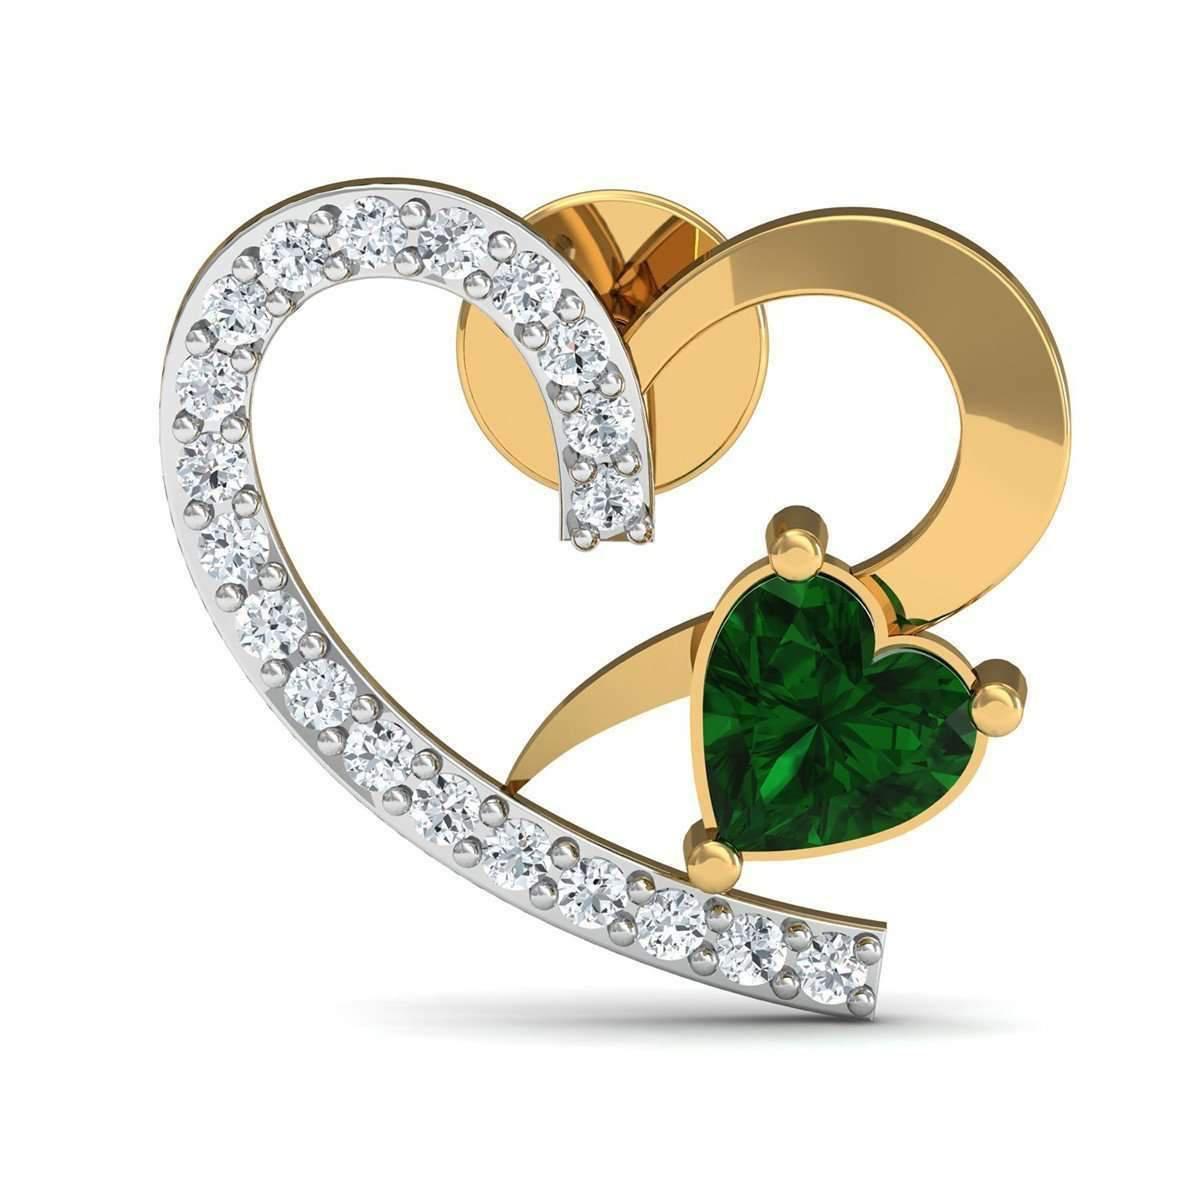 Diamoire Jewels Heart Cut Emerald and Diamond Earrings in 18kt Yellow Gold Mu6ZHe0